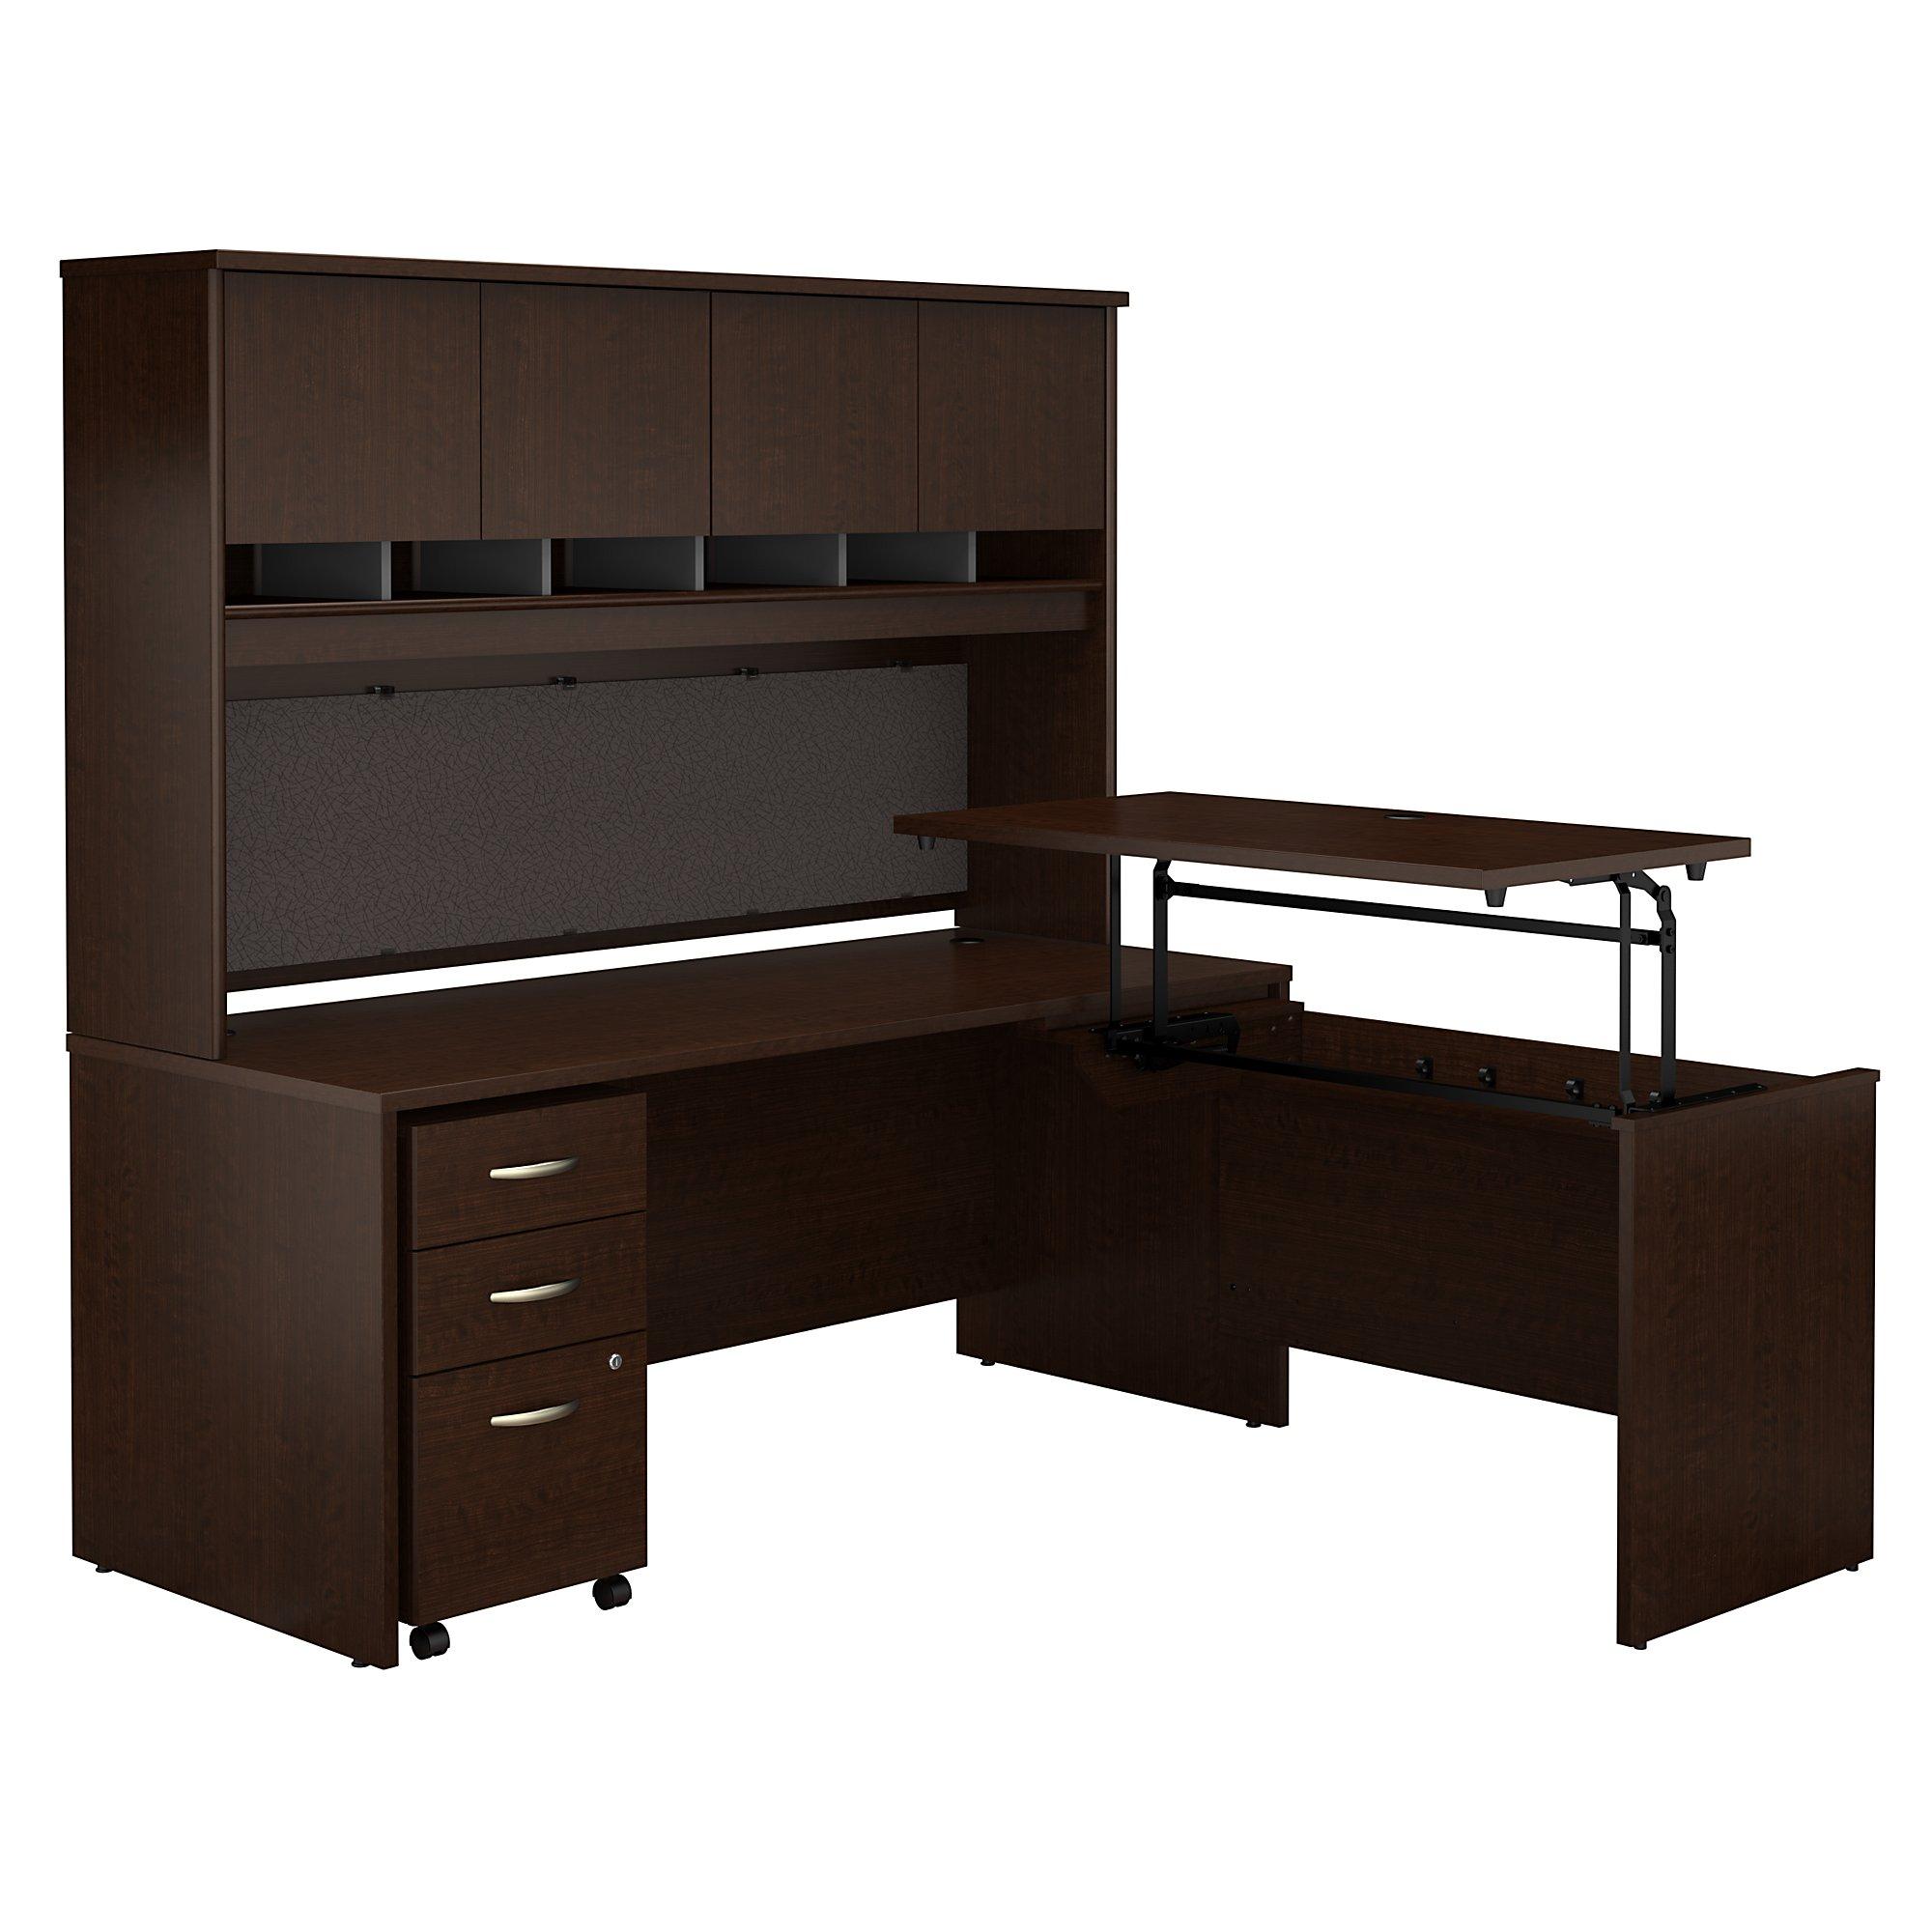 series c l-desk src124 with mocha cherry finish